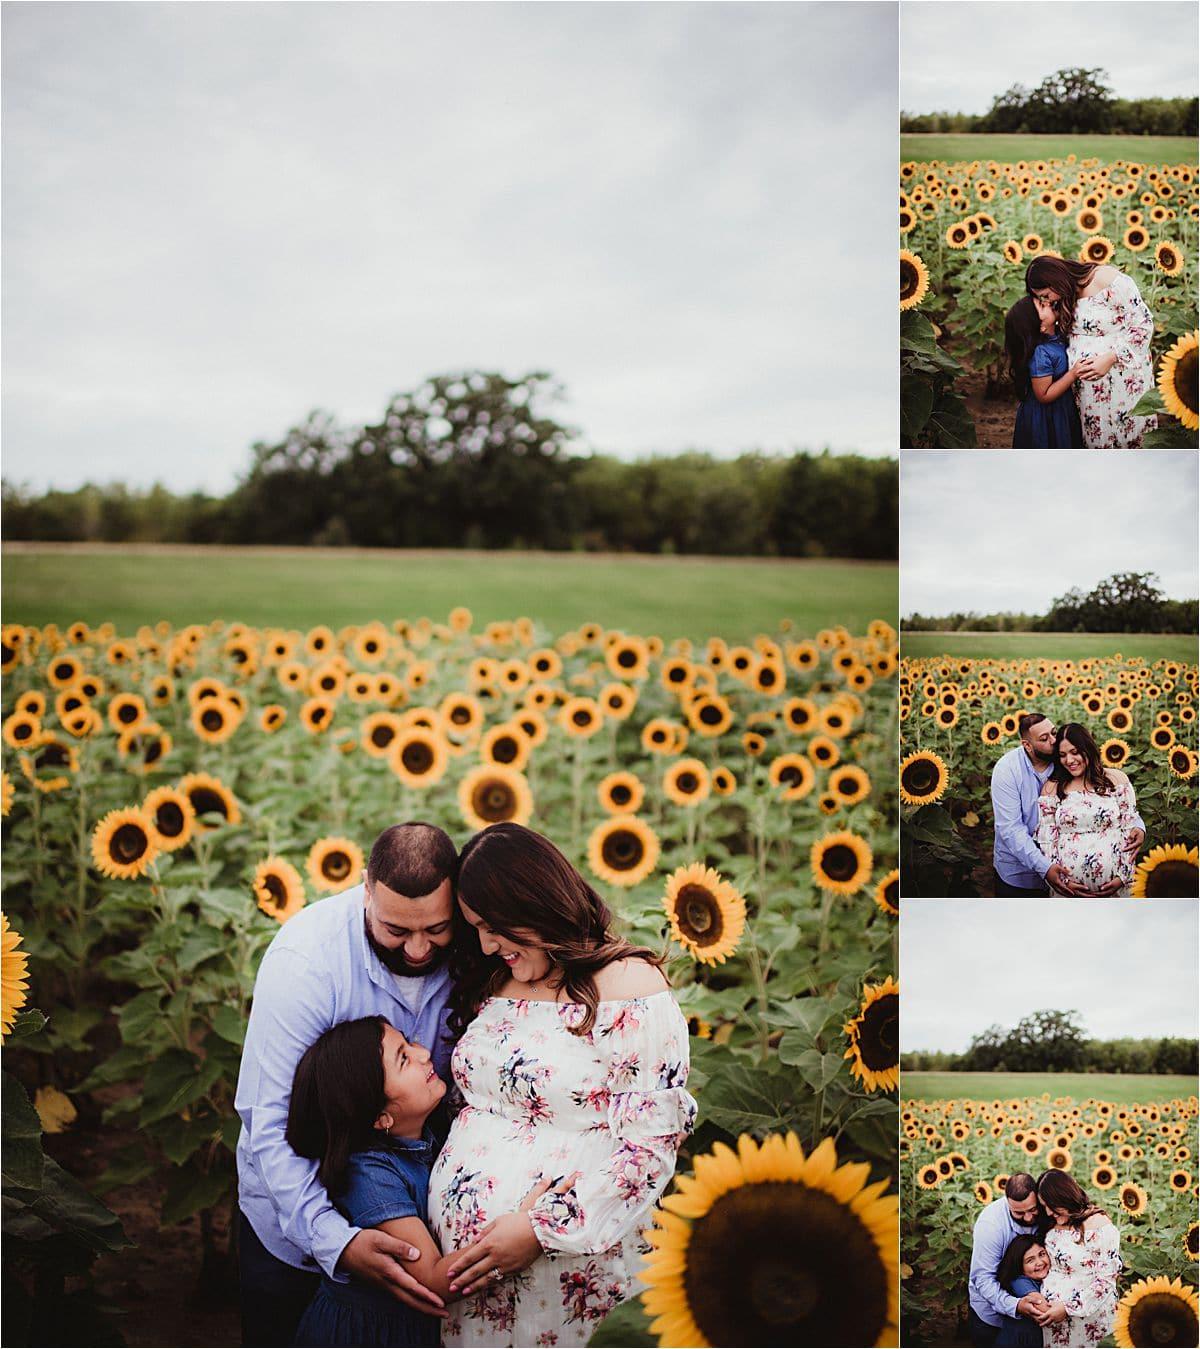 Family in Sunflower Field